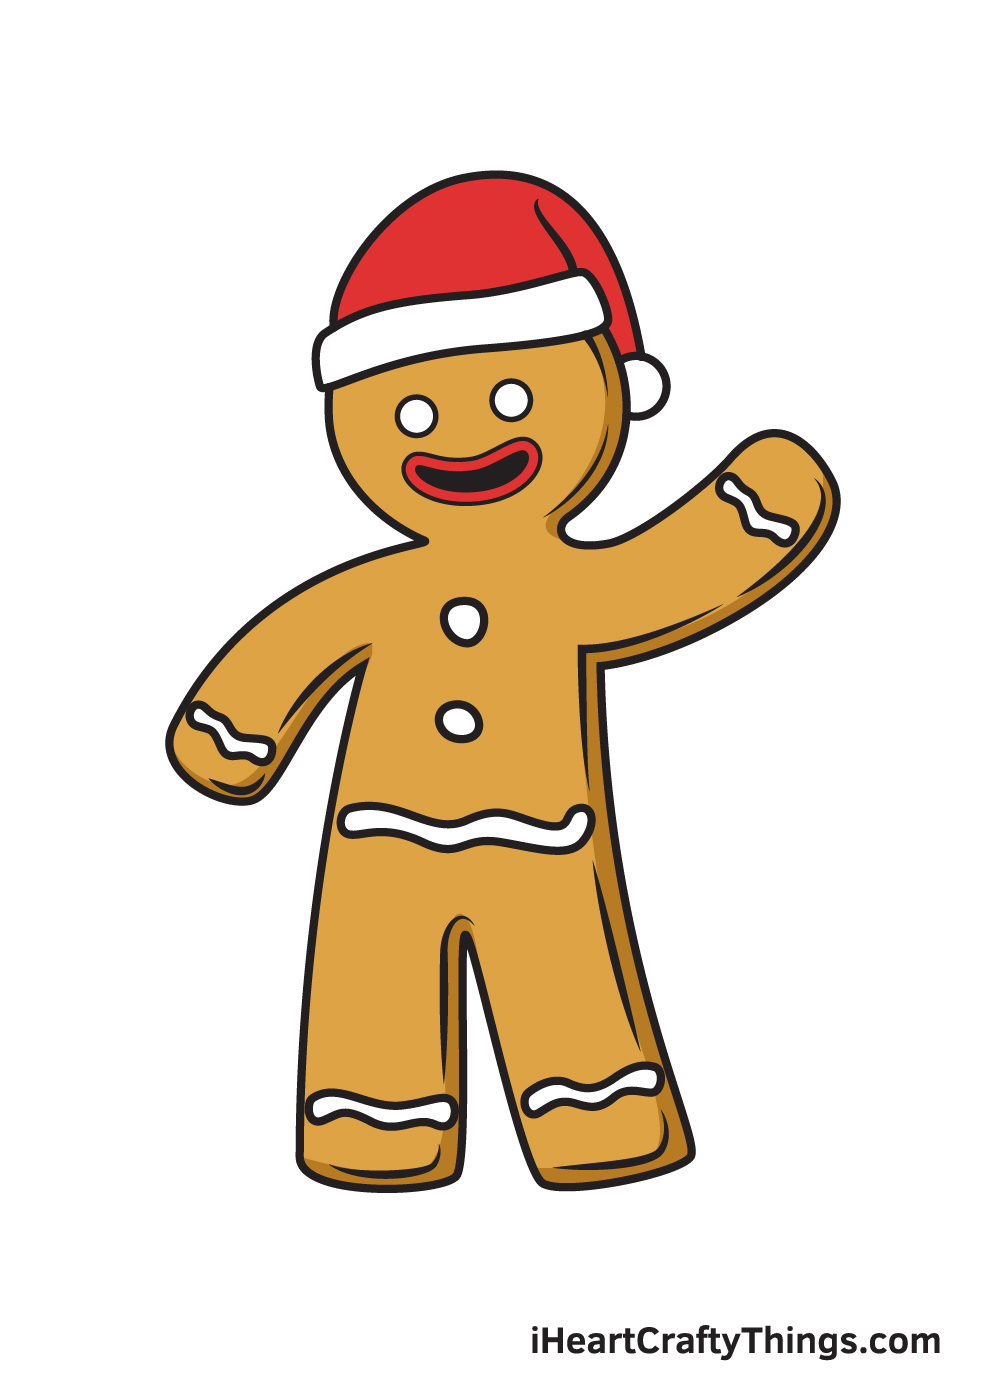 gingerbread man drawing 9 steps